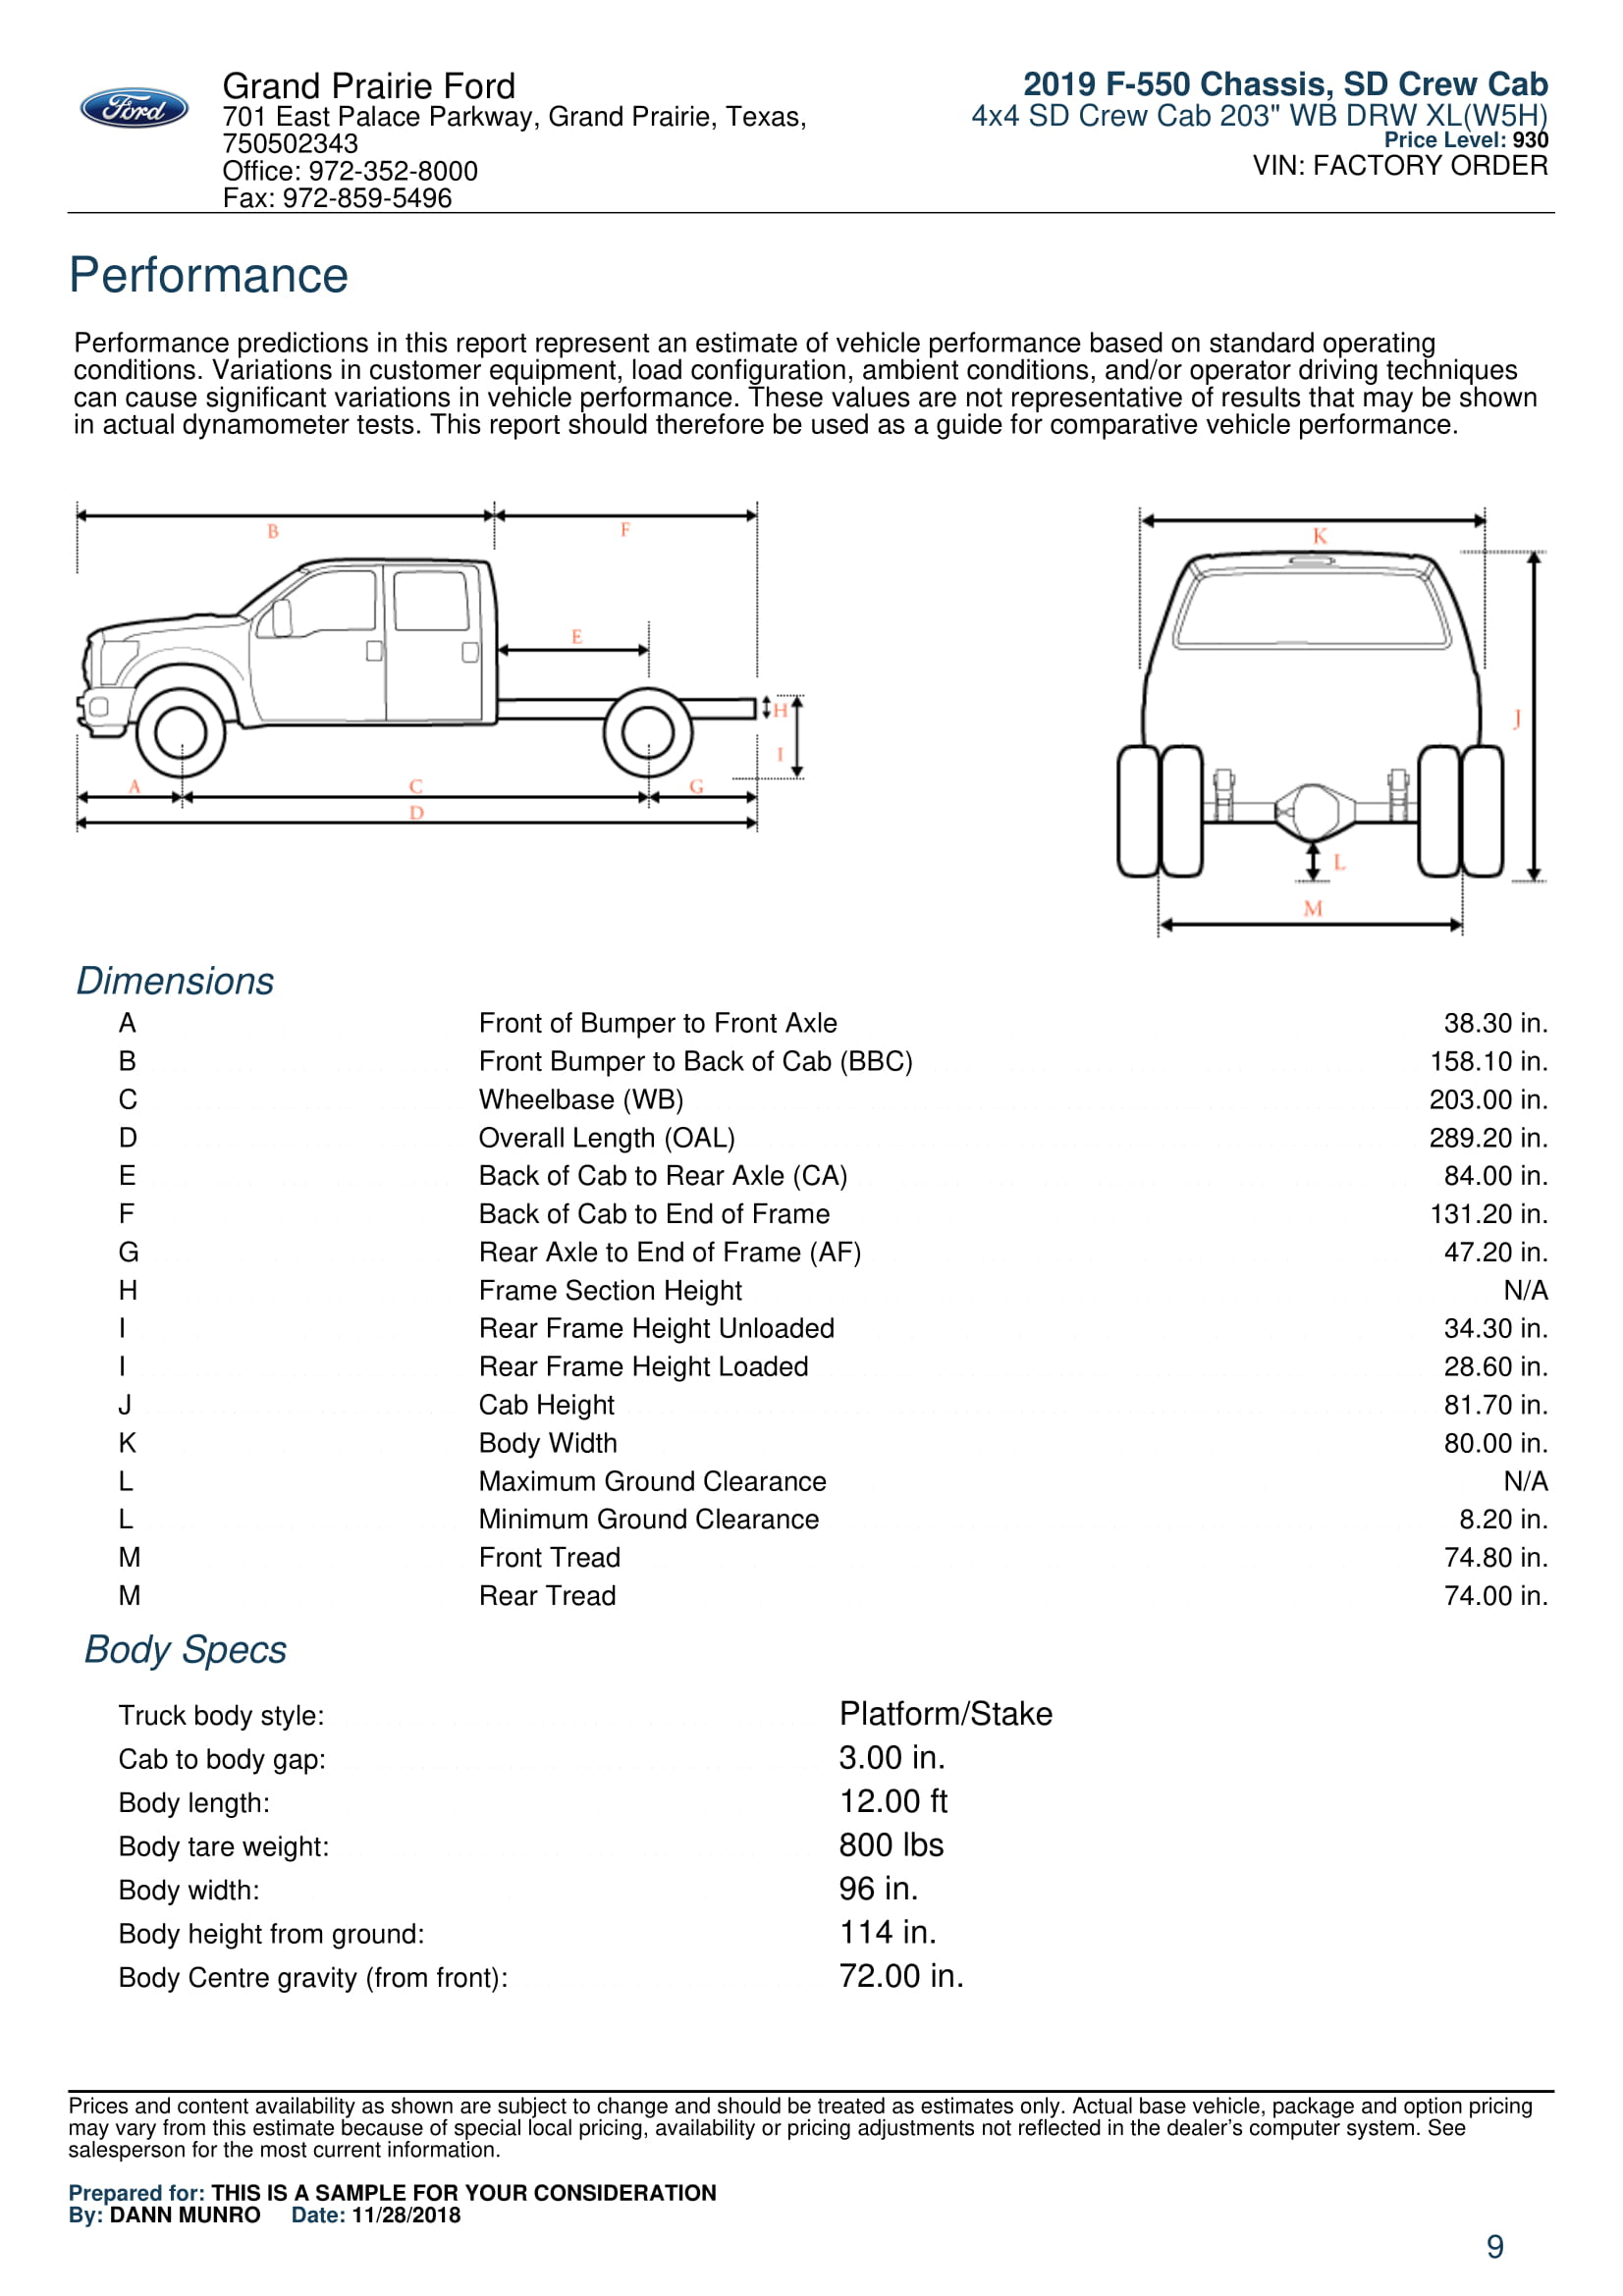 2019 F550 XL Crew Cab For Sale